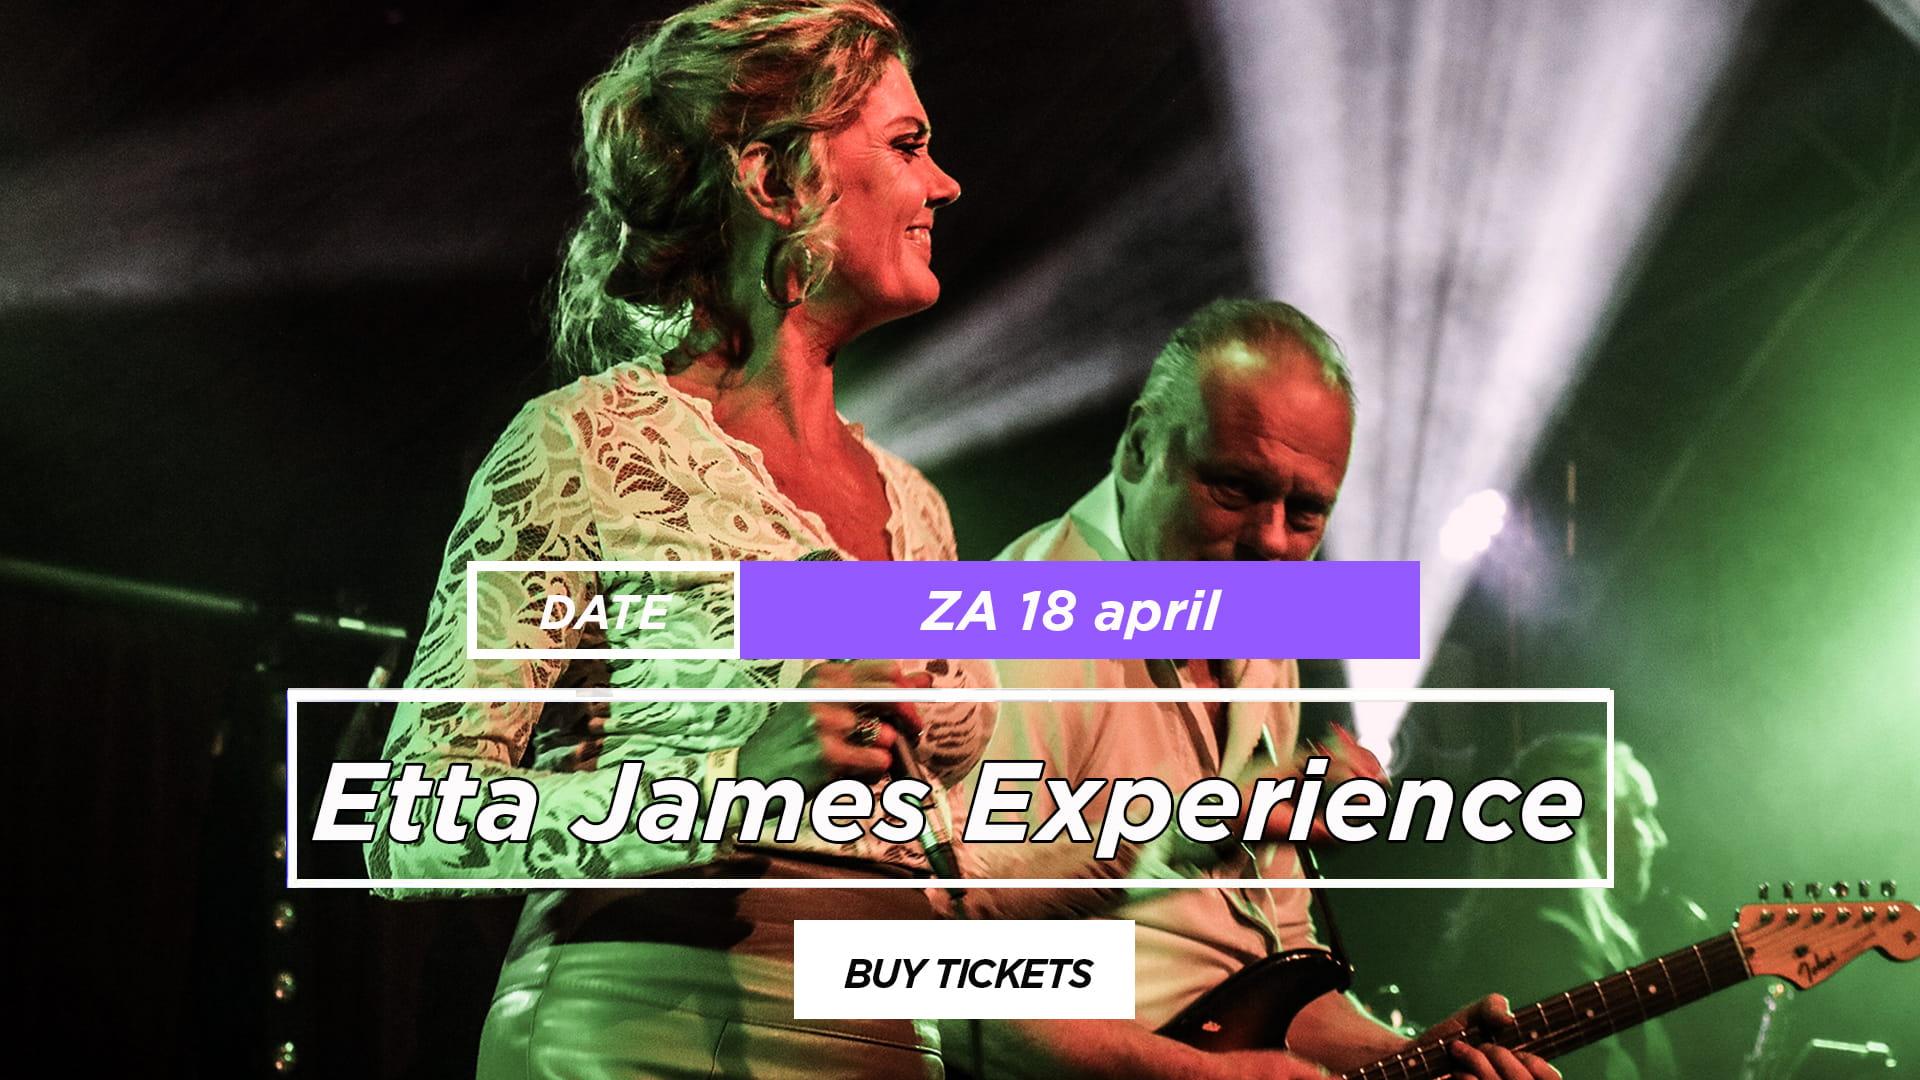 Etta James Experience